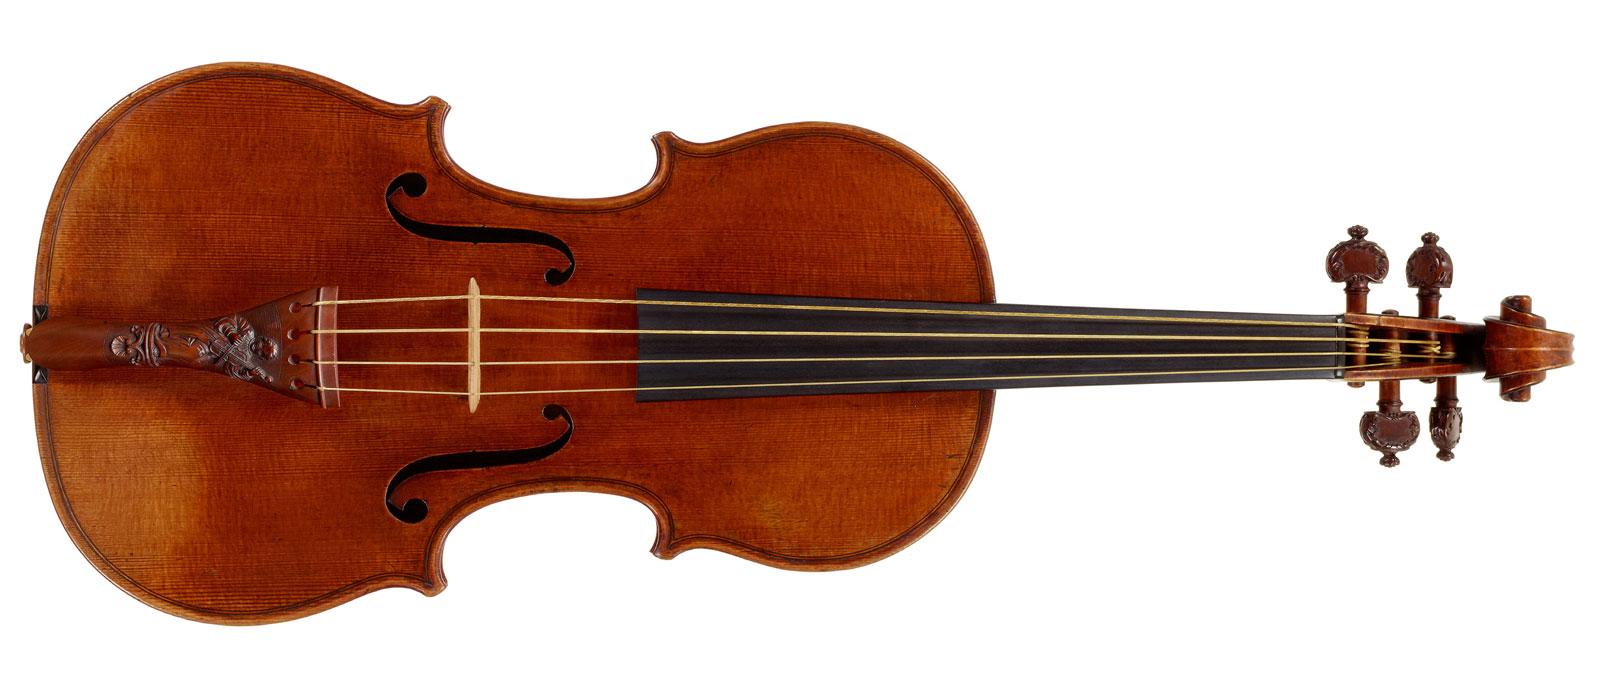 http://www.extravaganzi.com/wp-content/uploads/2011/06/Lady-Blunt-Stradivarius-Violin.jpg